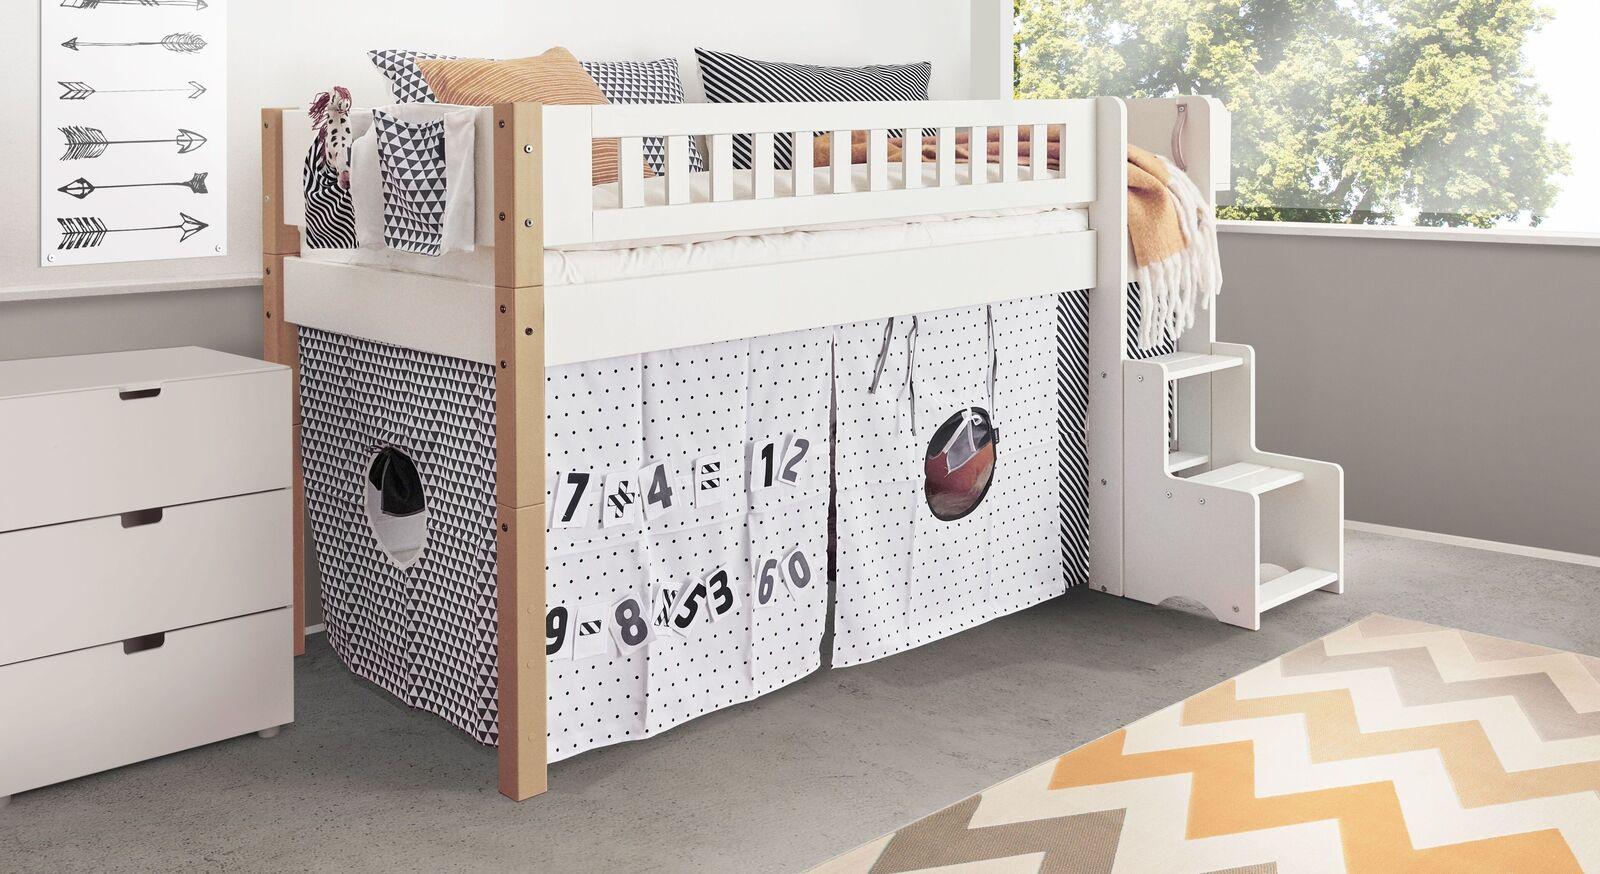 Mini-Hochbett Kids Town Design mit Buchenholzpfosten